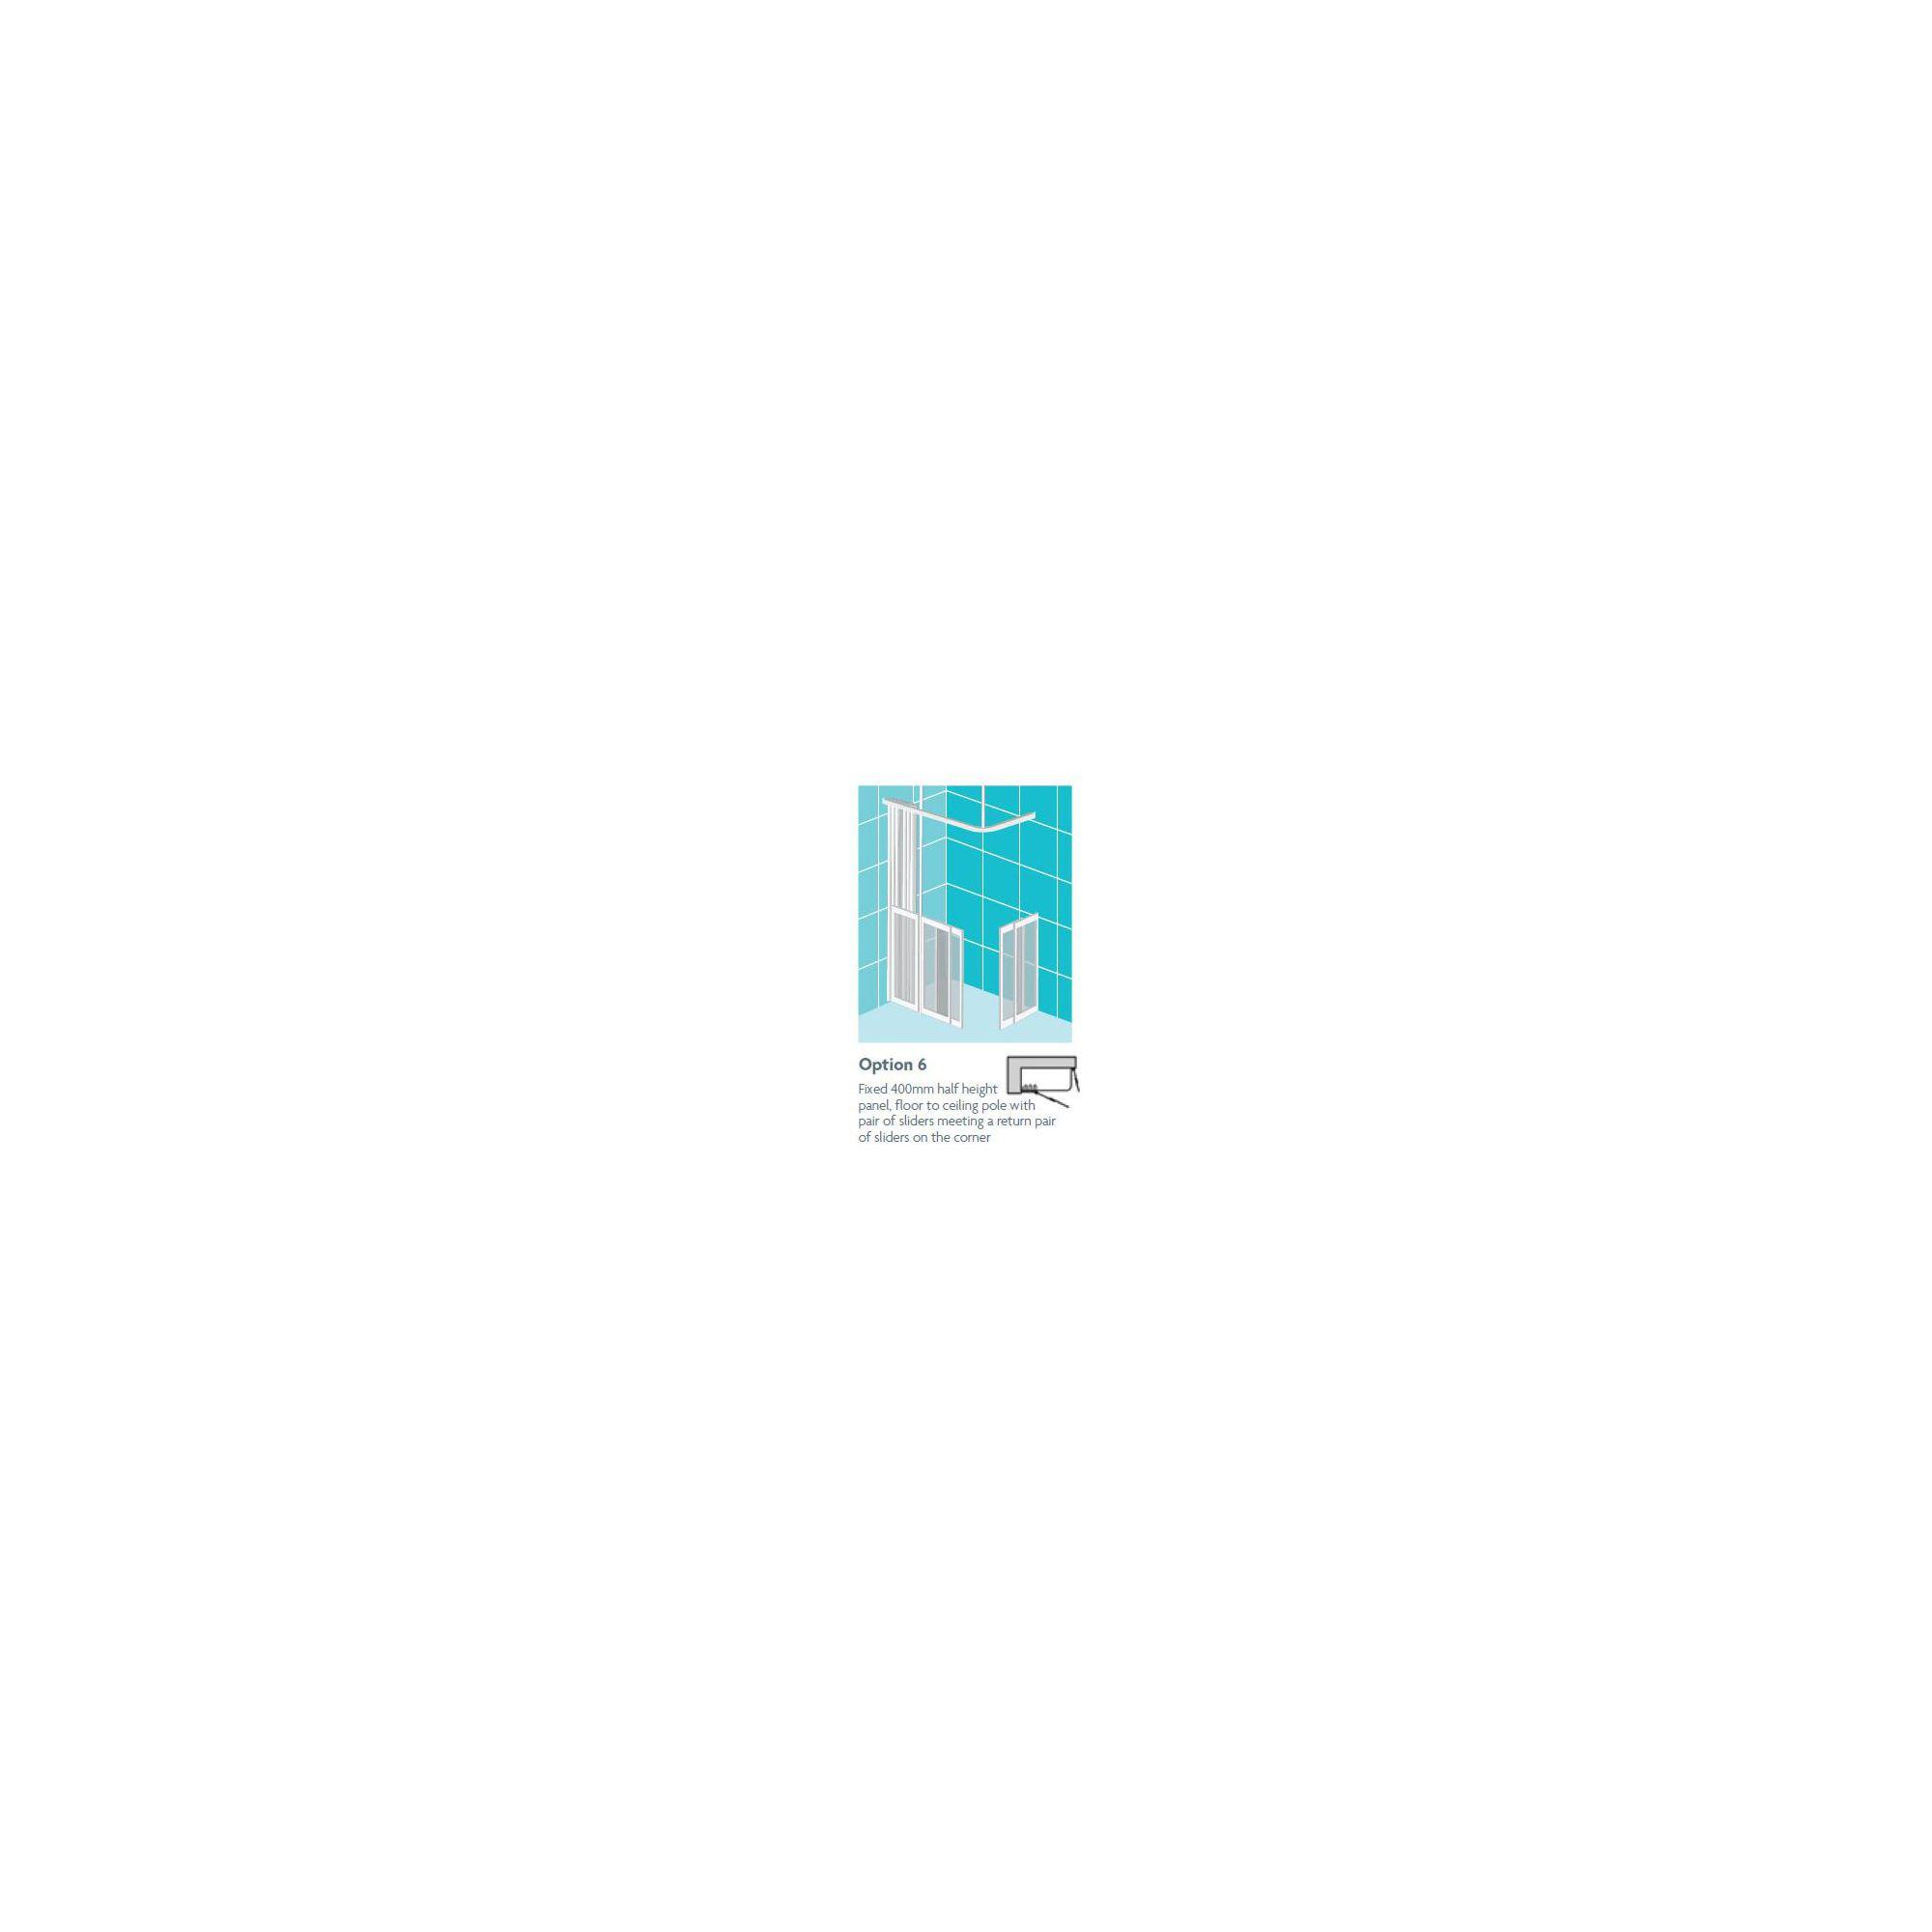 Impey Supreme Corner Door Option 6 Left Hand 1200mm x 750mm at Tescos Direct